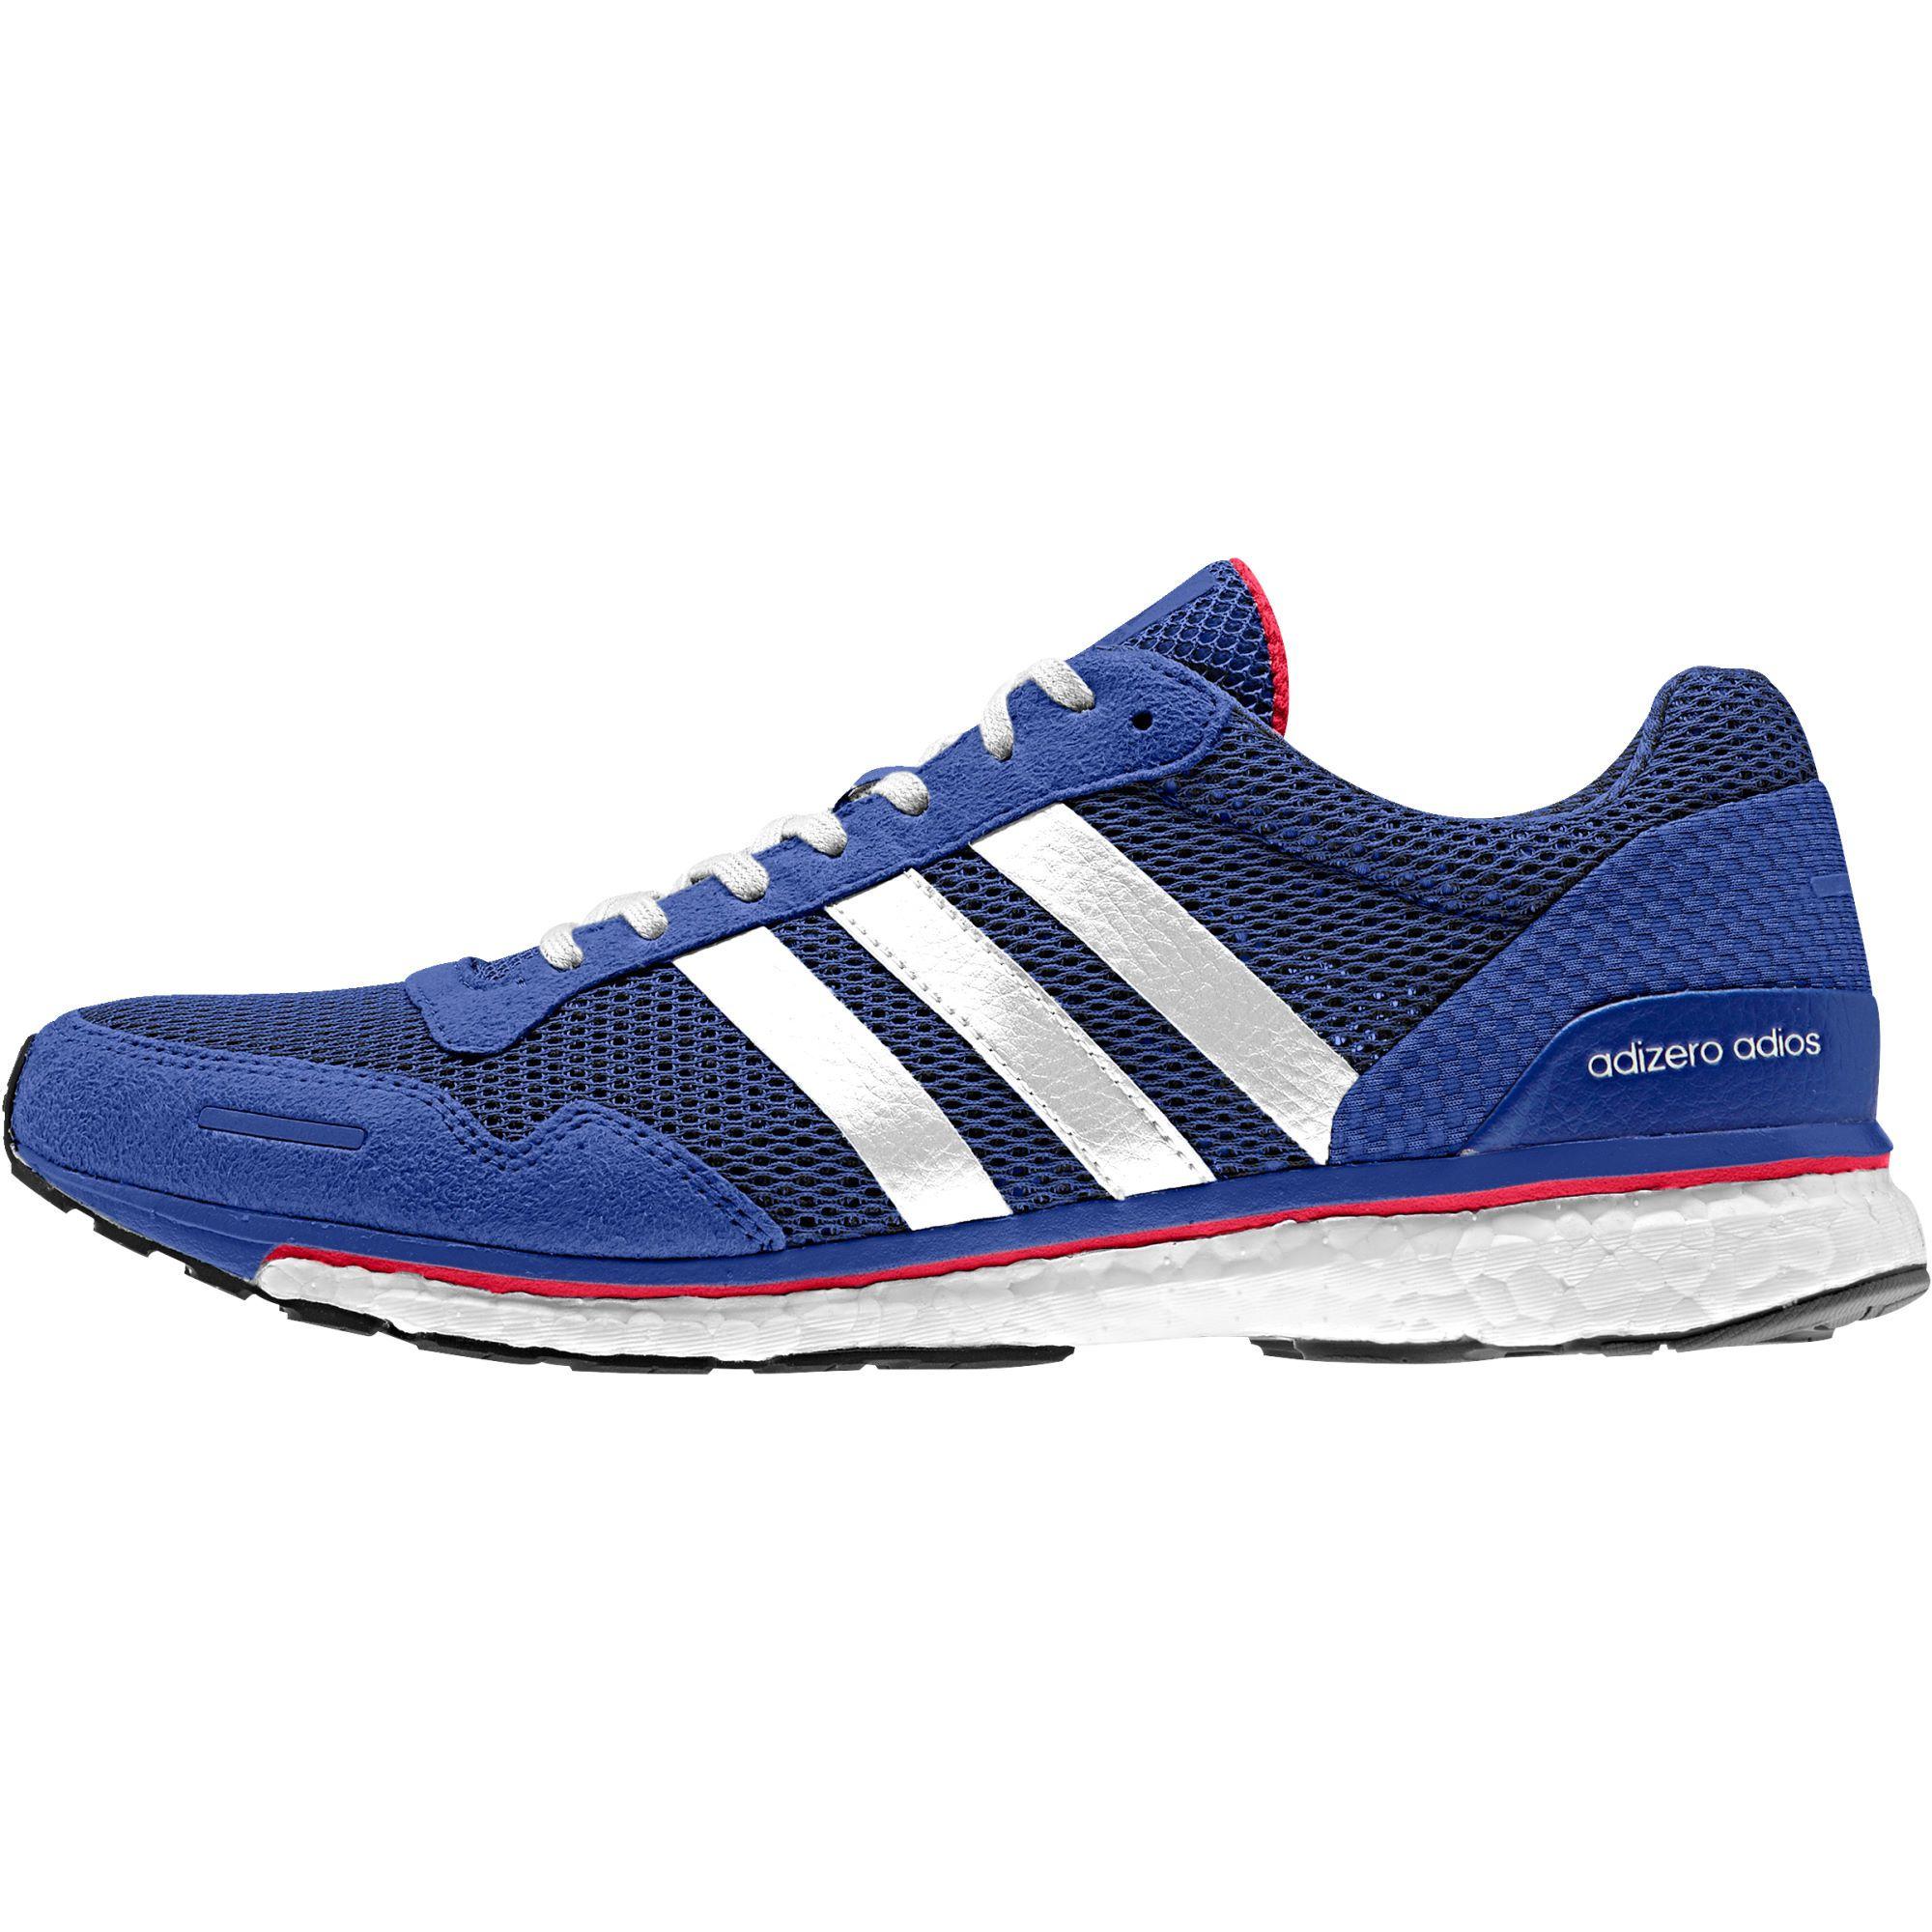 adidas Adizero Adios 3 Aktiv Boost Mens Running Shoes